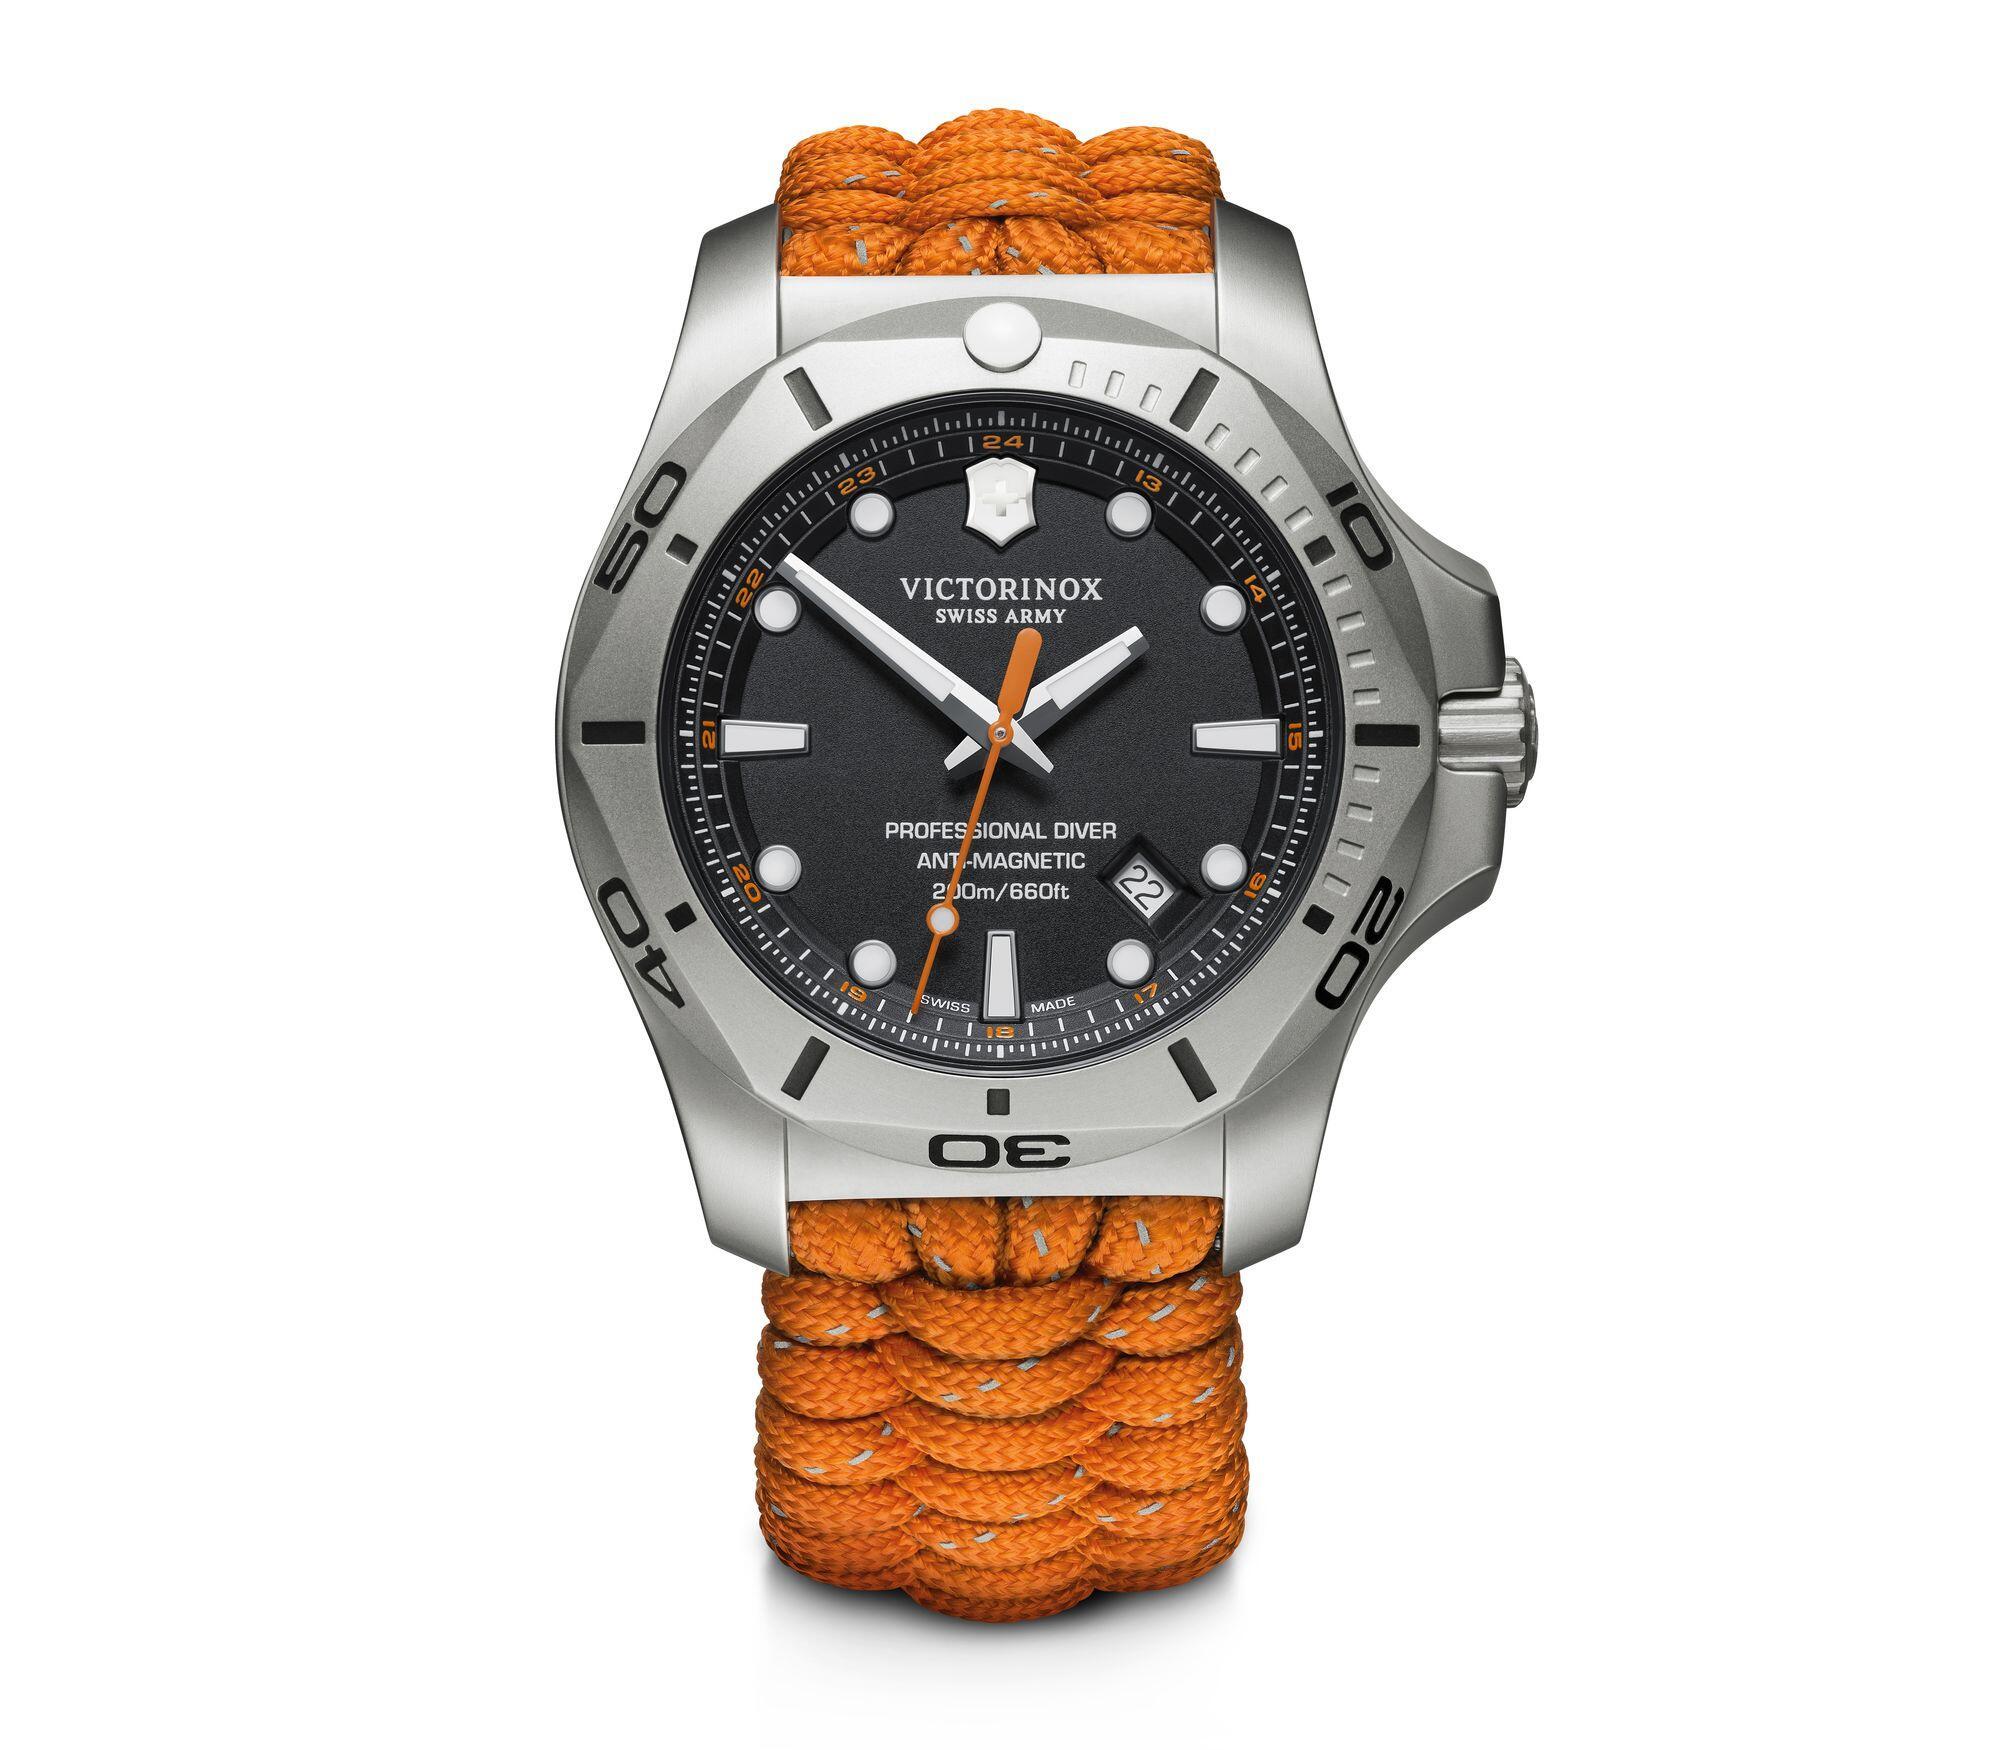 INOX Professional Diver